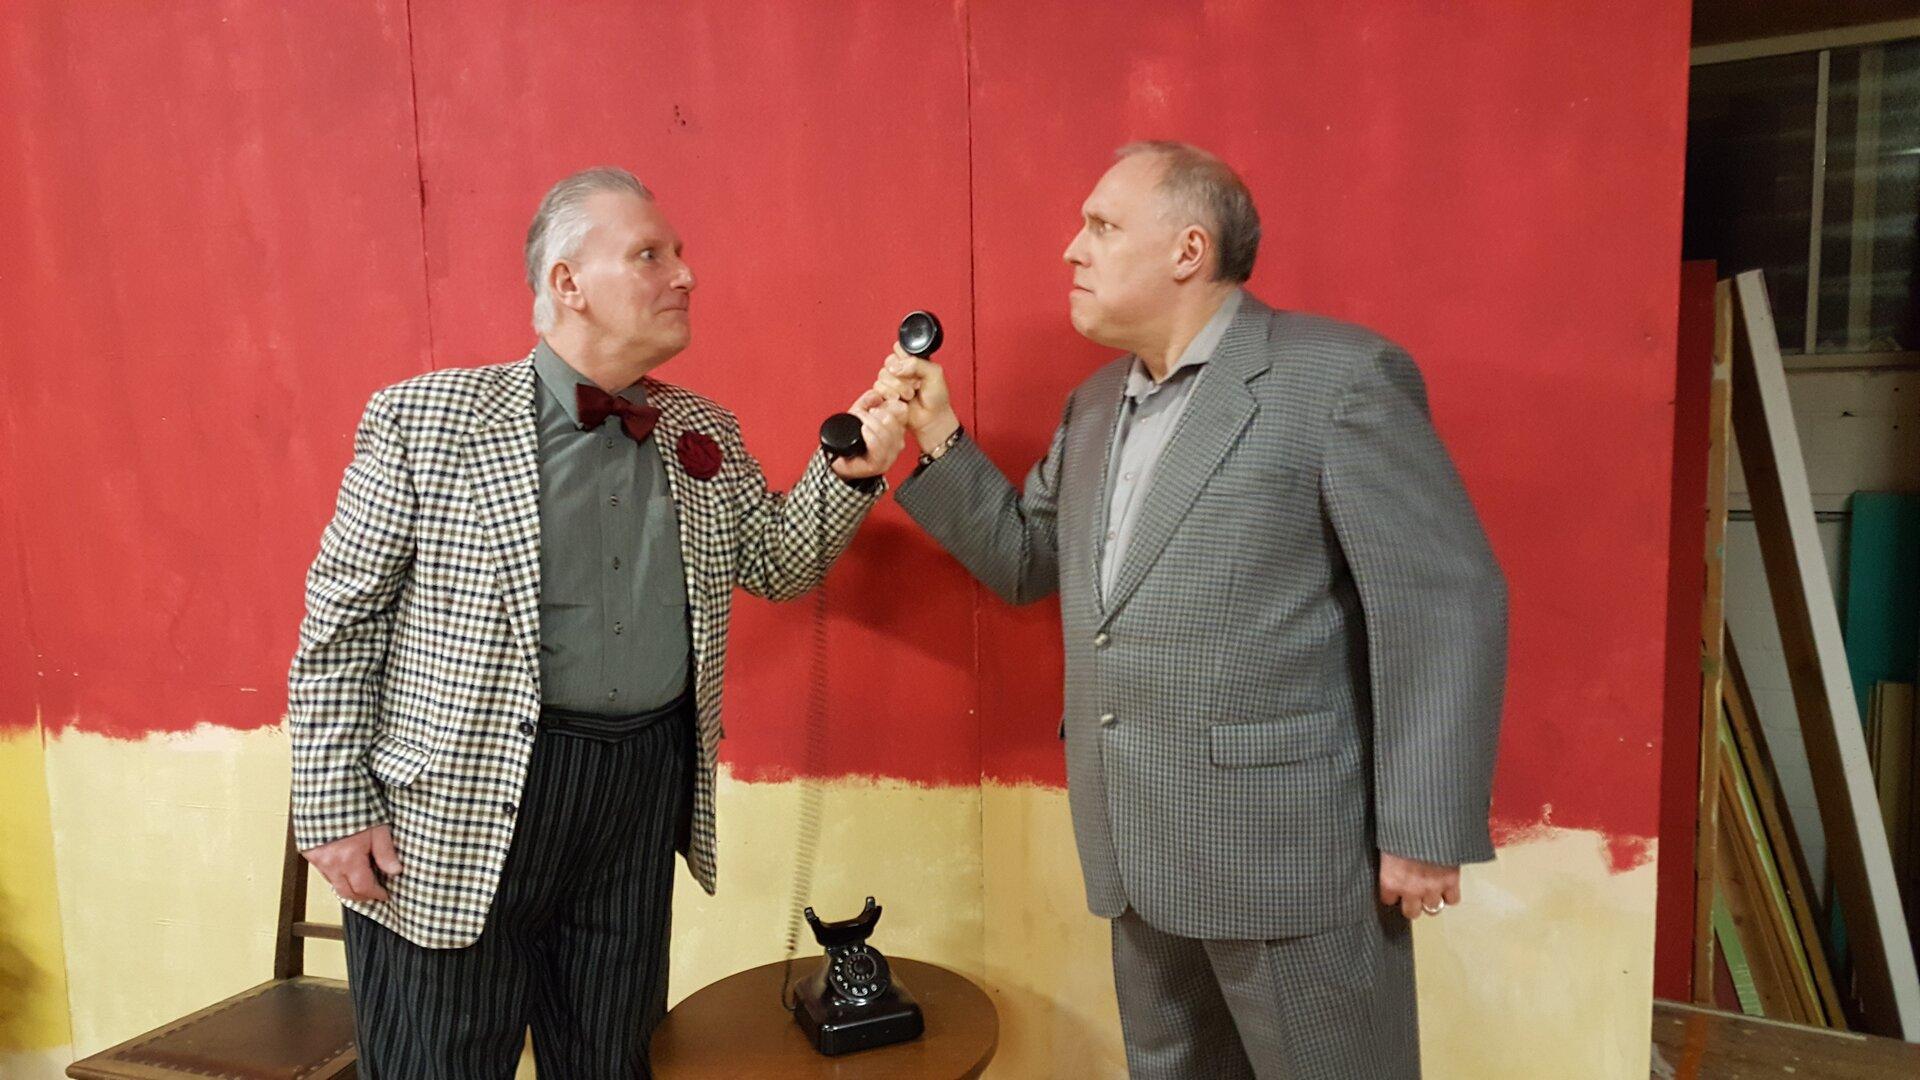 Anrufen ja oder nein? Szene mit Andree Uphoff (links) und Hero Kruse.